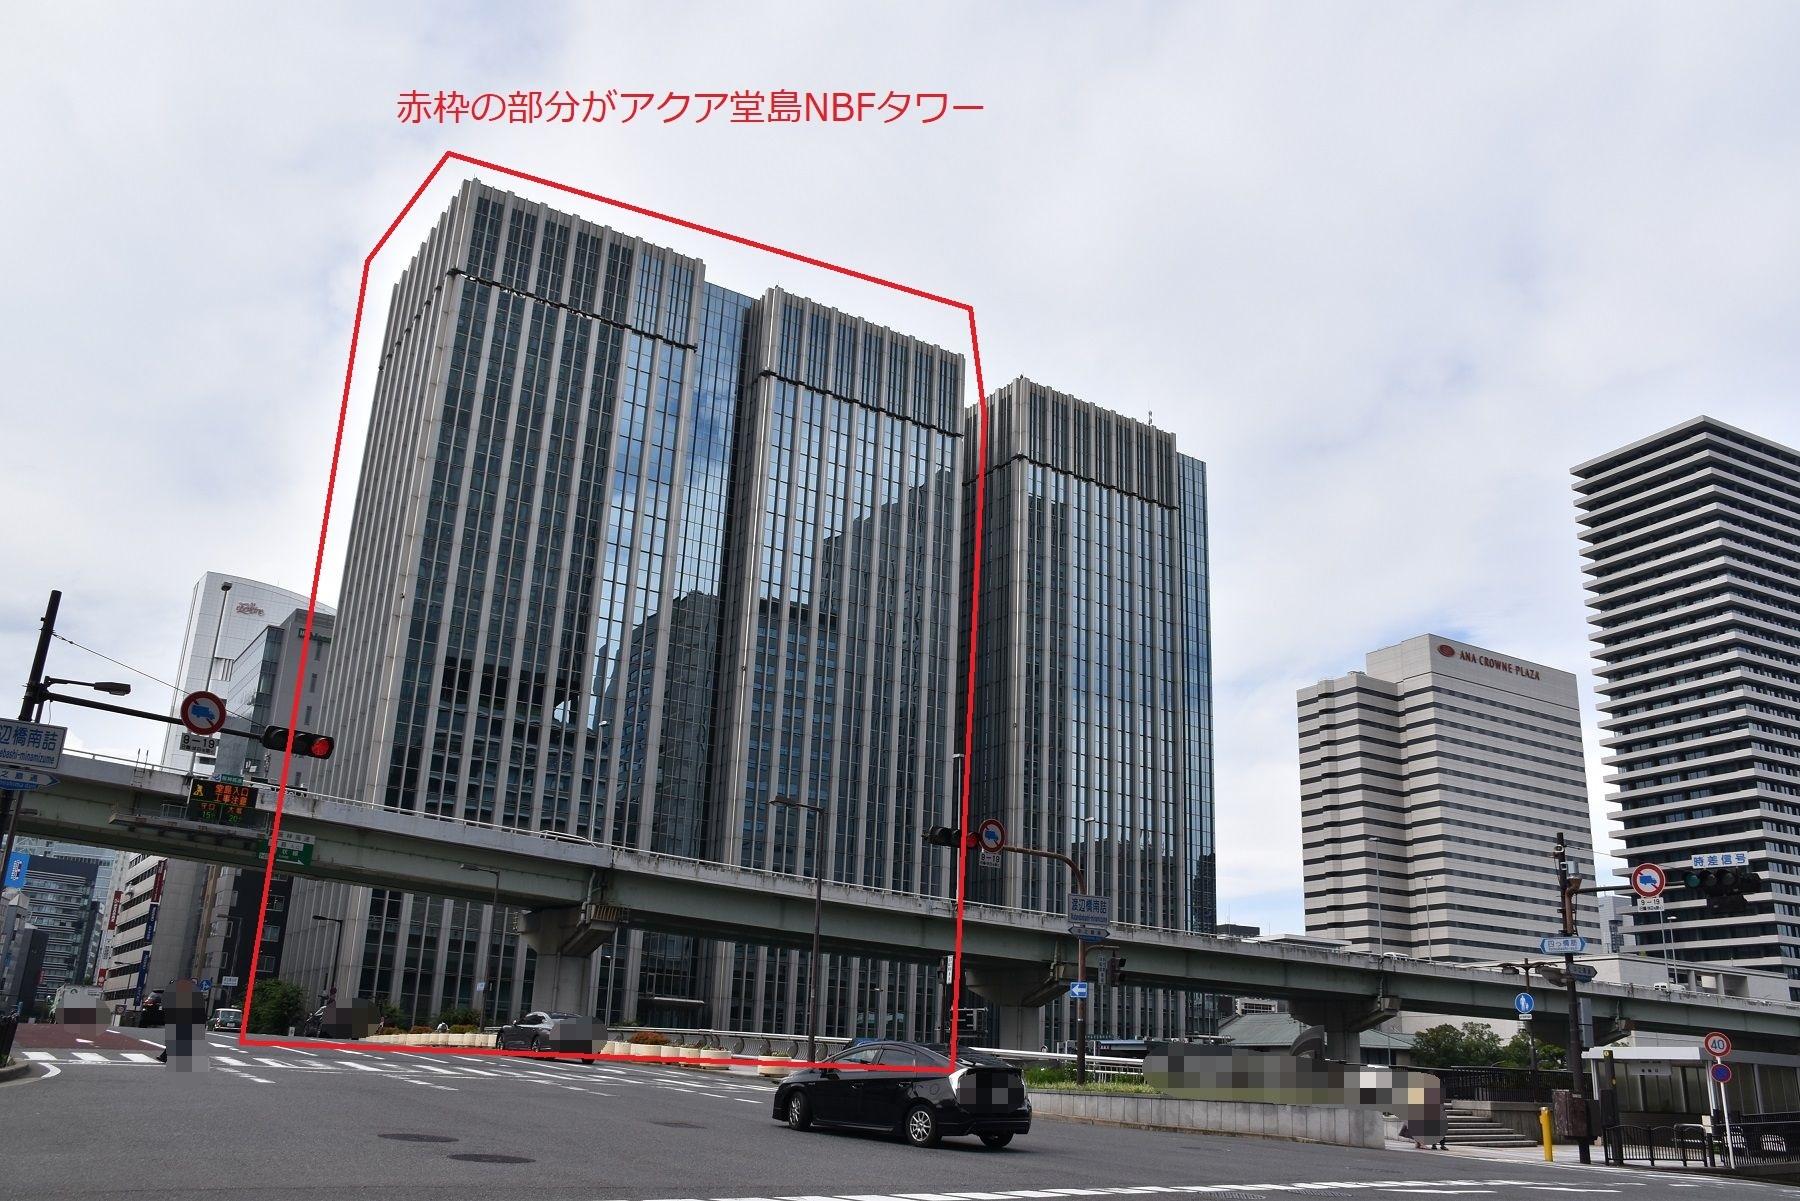 DSC_0562_1.JPG